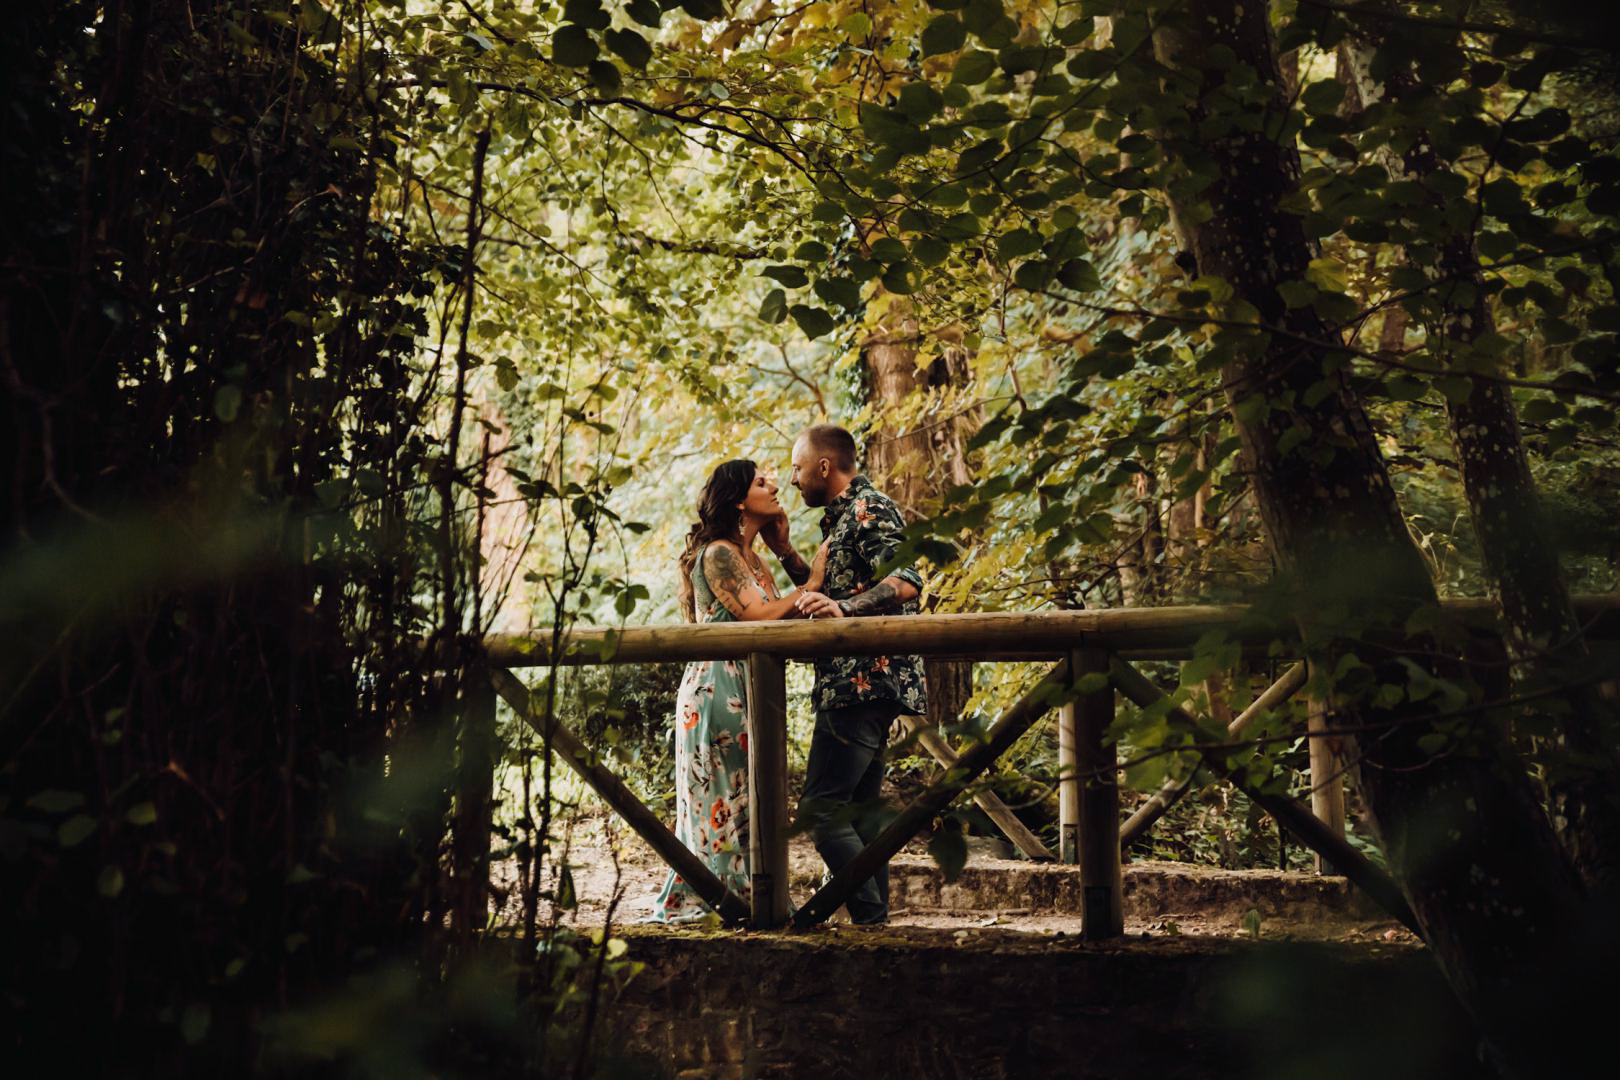 Photographe Couple Mulhouse - Photographe Couple Haut-Rhin - Photographe Couple Colmar - Photographe Mulhouse - Wild photography - Photographe Mariage Mulhouse - Photographe Mariage Colmar - Photographe Mariage Haut-Rhin - Bertrand DISDIER